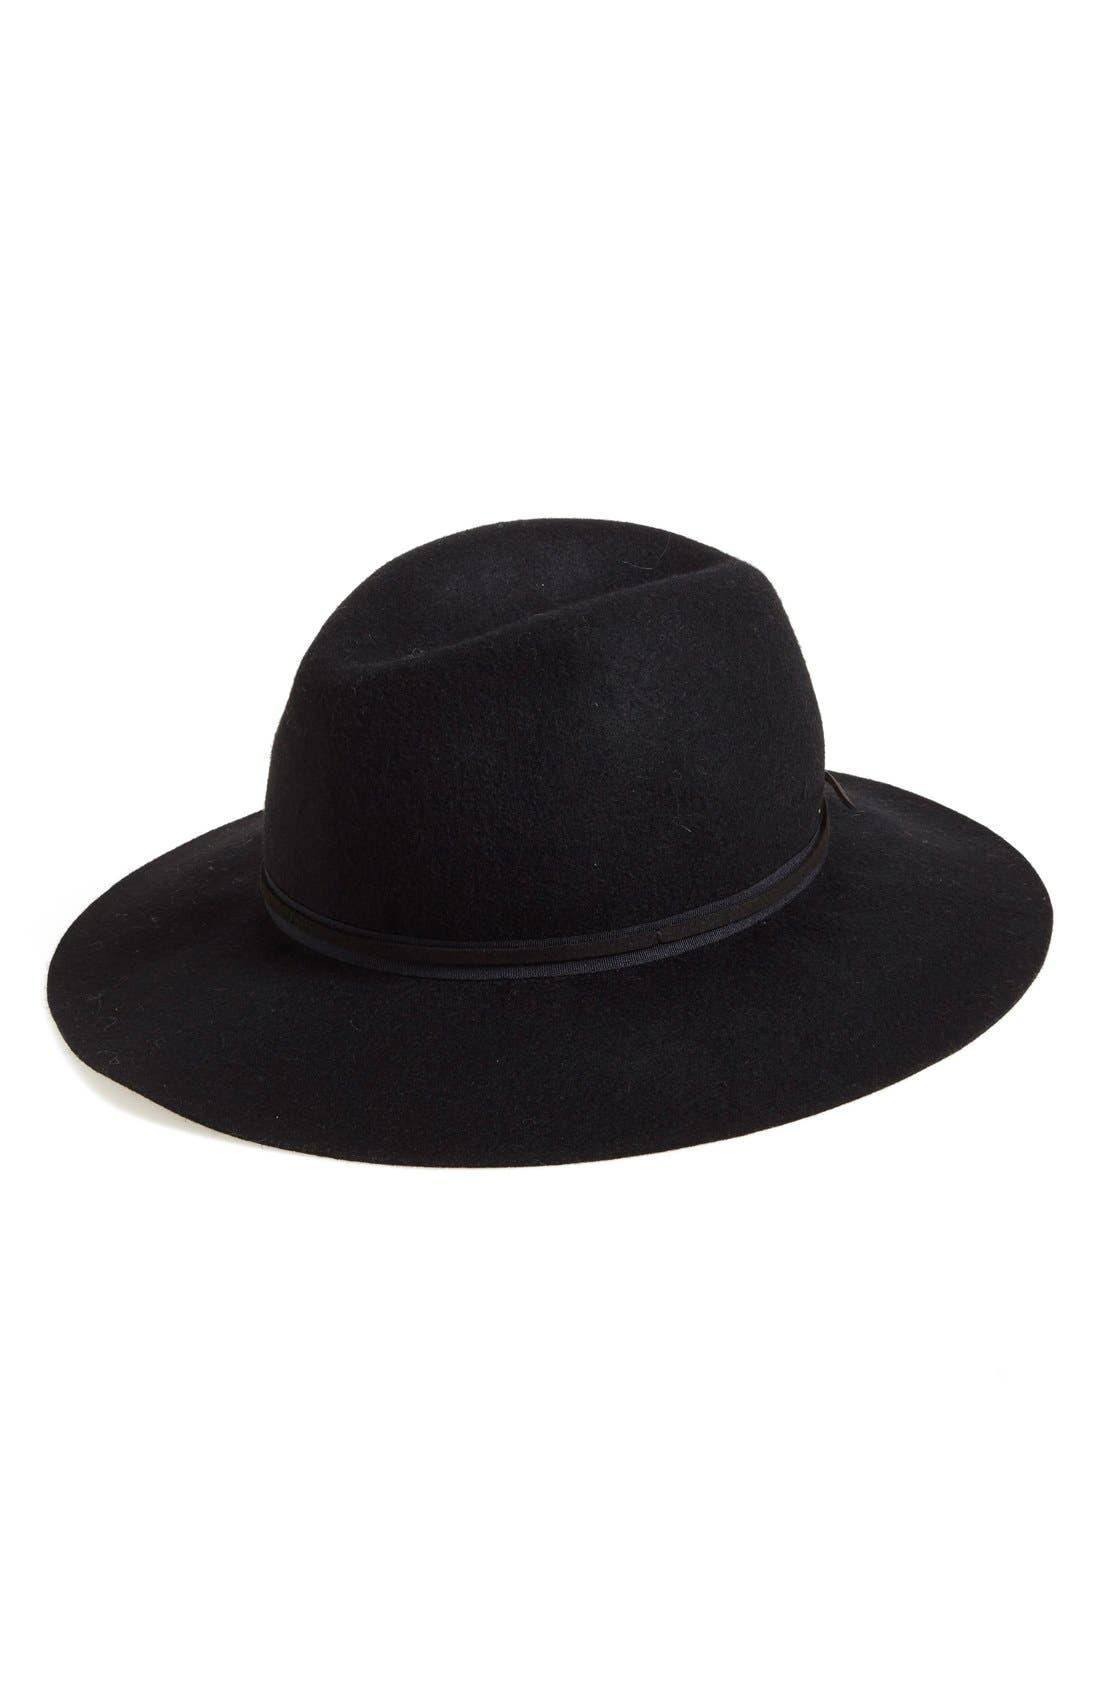 Alternate Image 1 Selected - Hinge Felted Wool Panama Hat